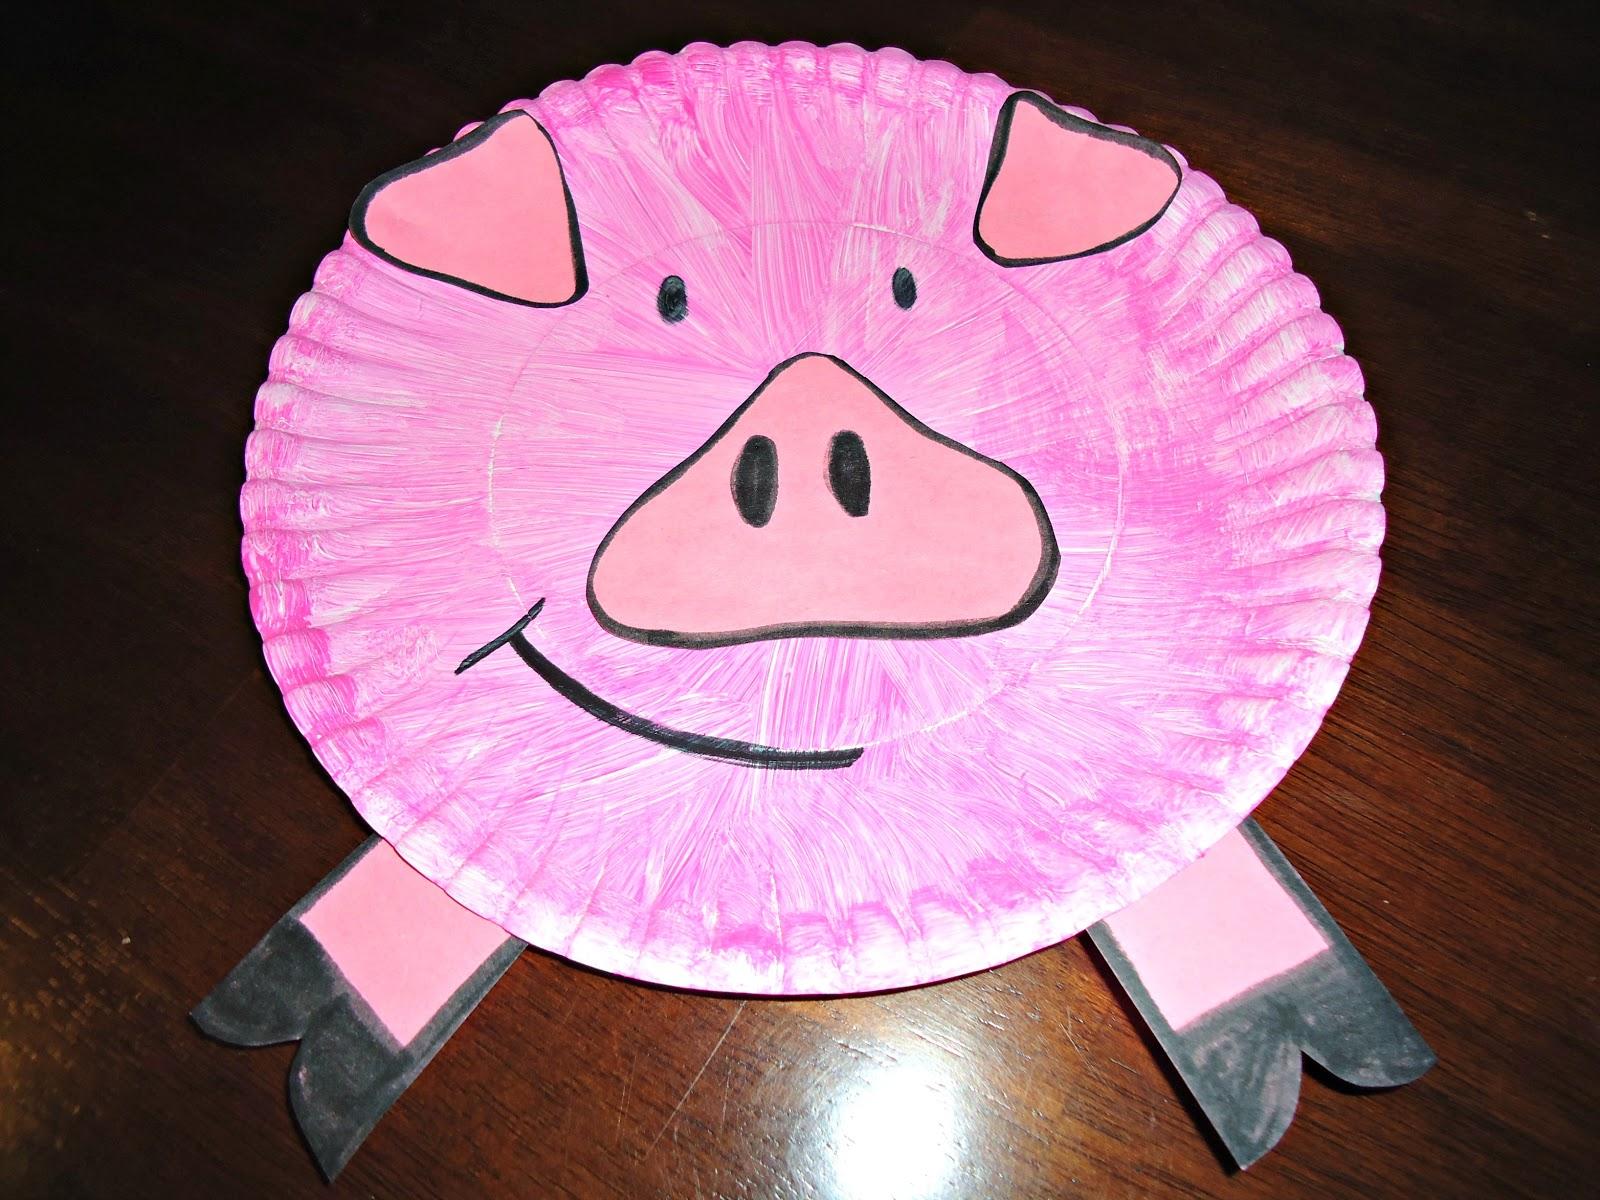 http://1.bp.blogspot.com/-jG4ZGcsKcCU/UJ3d-46EFMI/AAAAAAAACvA/cjfke4B0lCA/s1600/paper+plate+pig+4.jpg